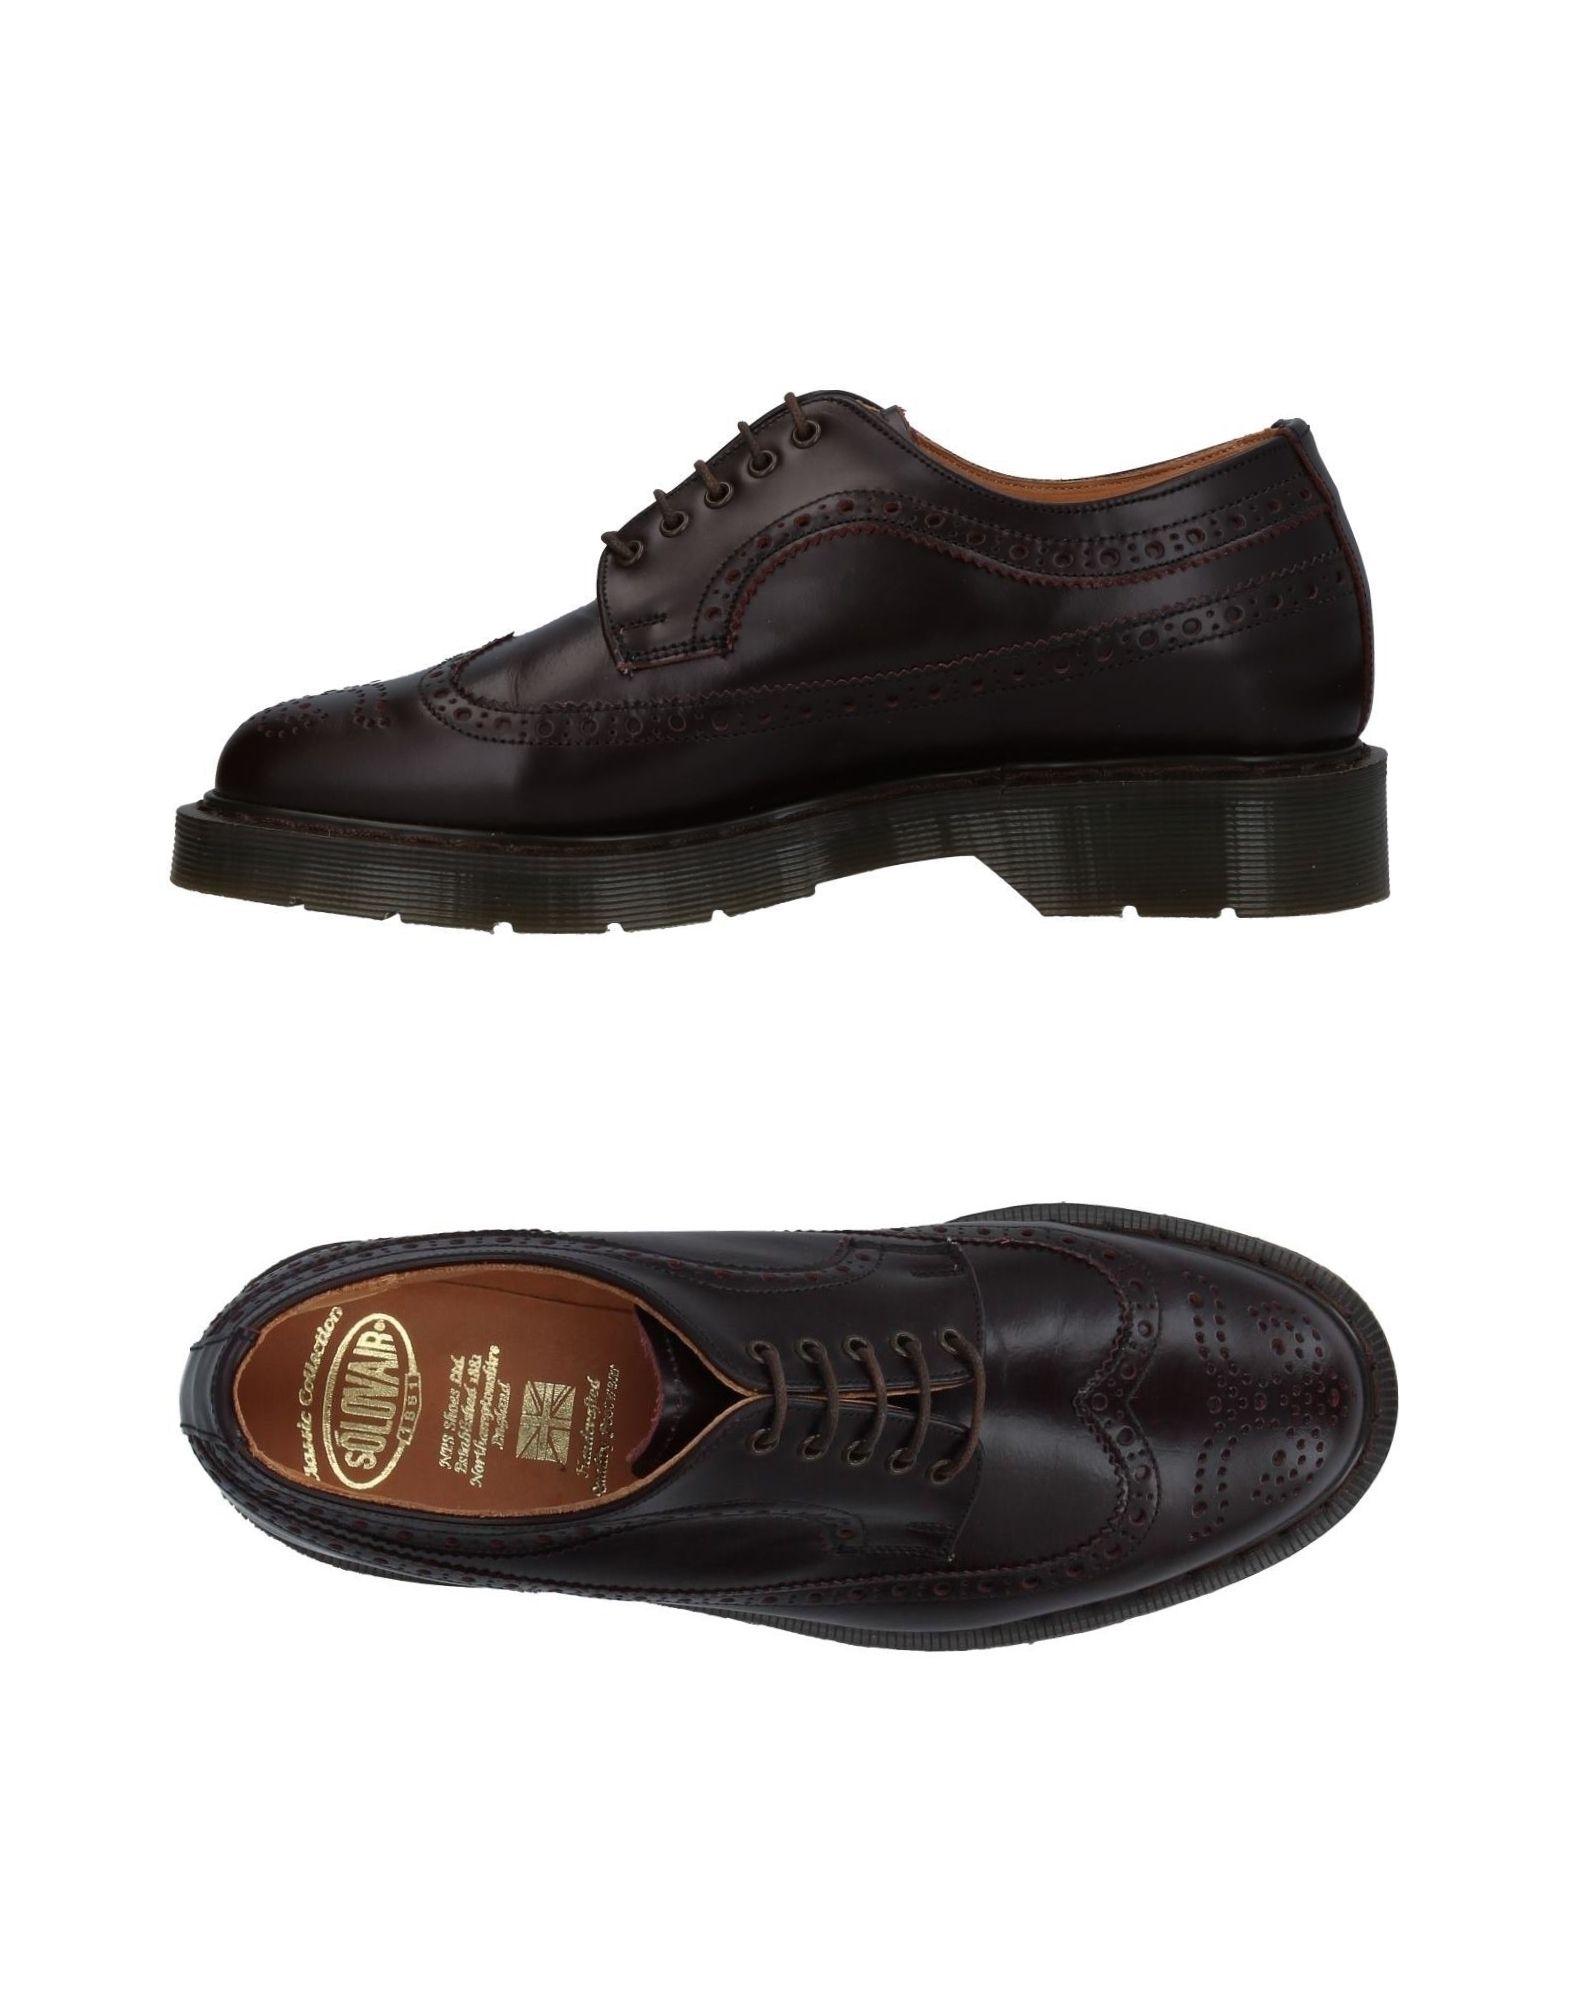 Chaussures À Lacets Solovair 1881 Femme - Chaussures À Lacets Solovair 1881 sur